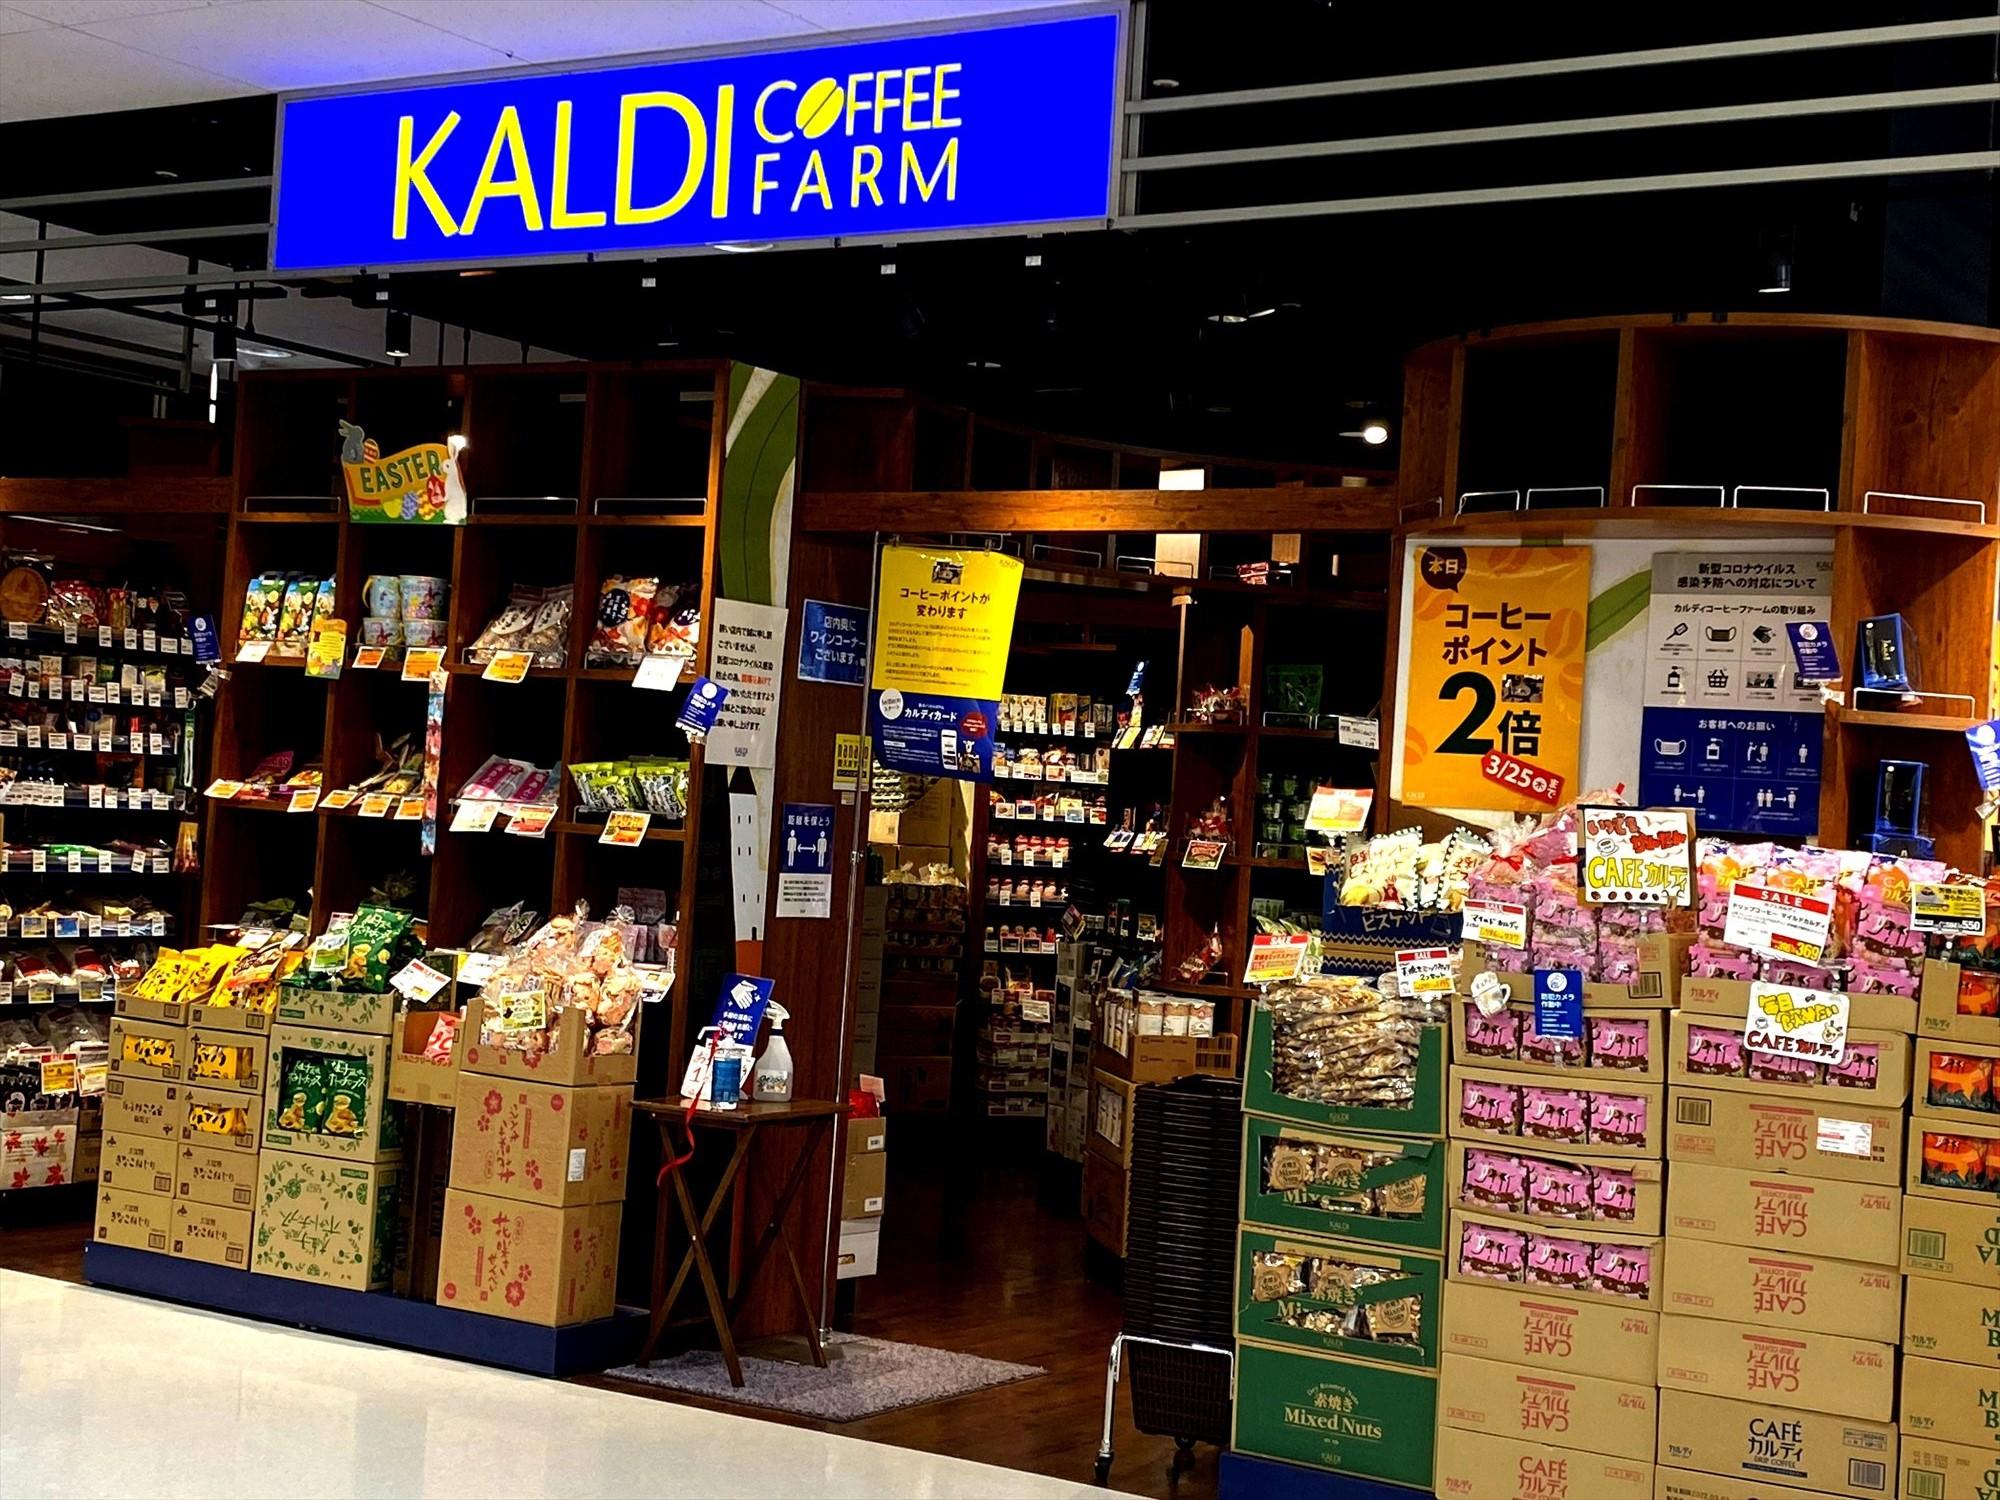 Kaldi Coffee Farm